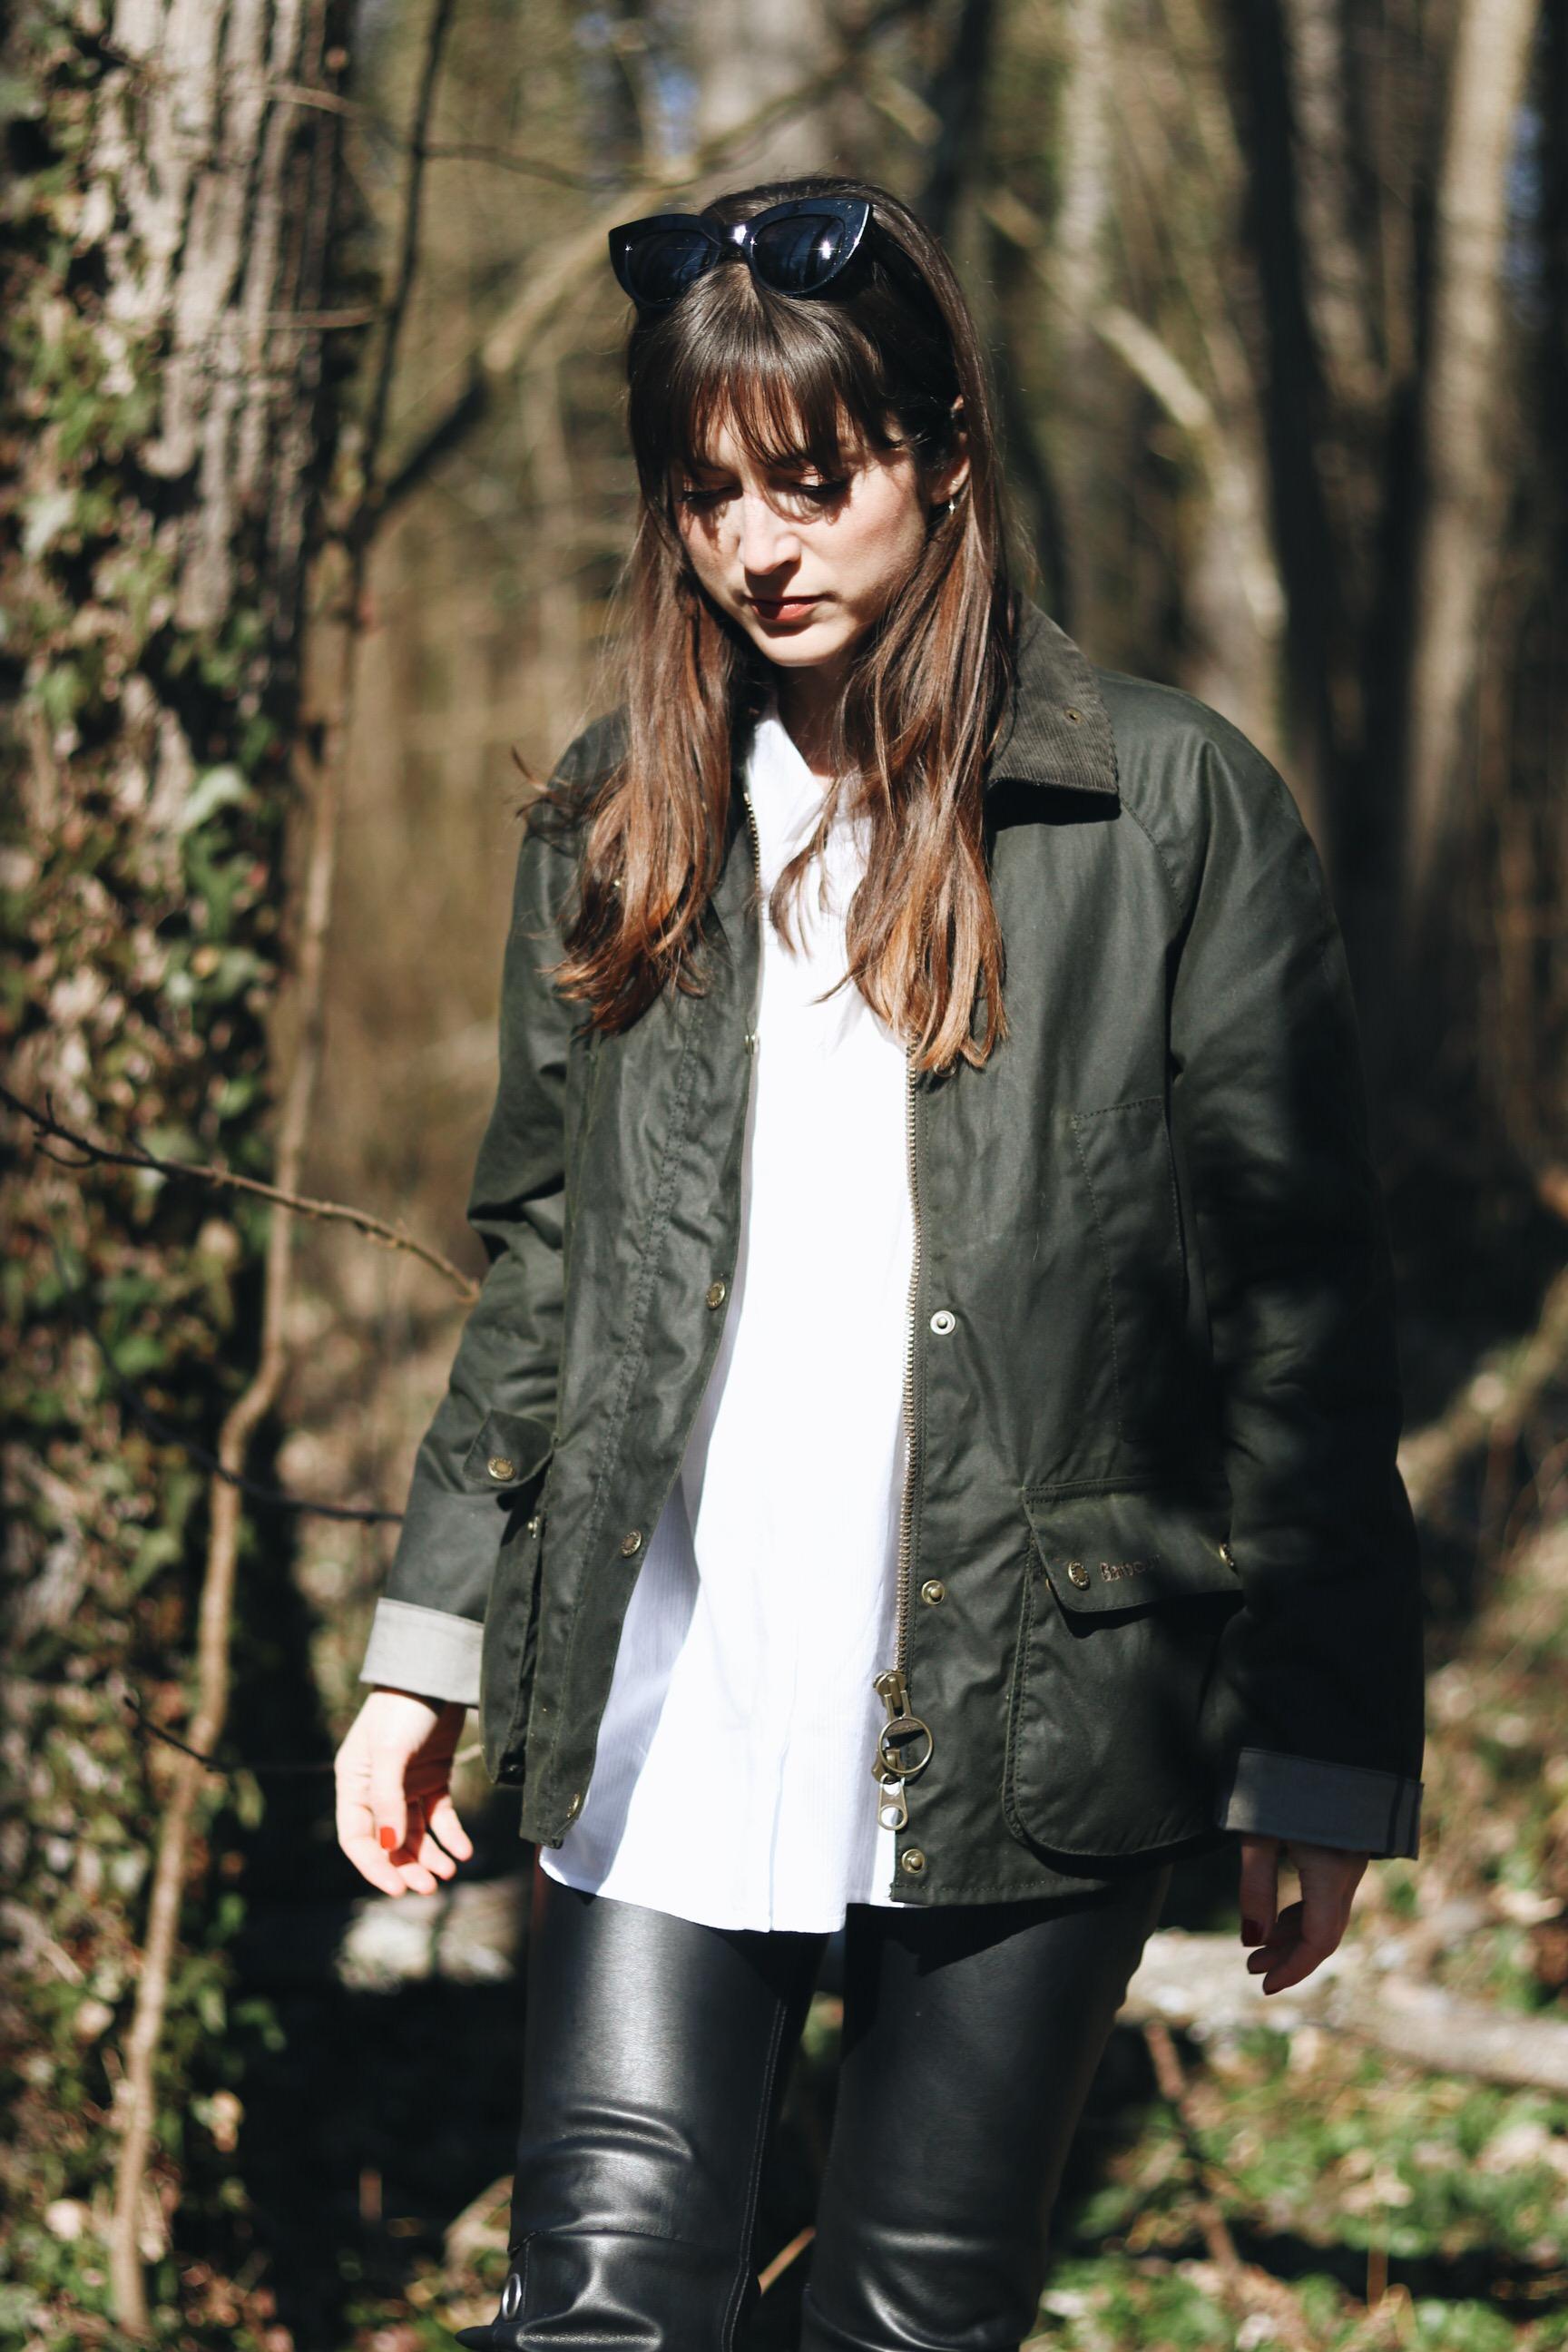 Barbour Jacke Outfit Blog wander wandern Celine Sonnenbrille klassisch gruen